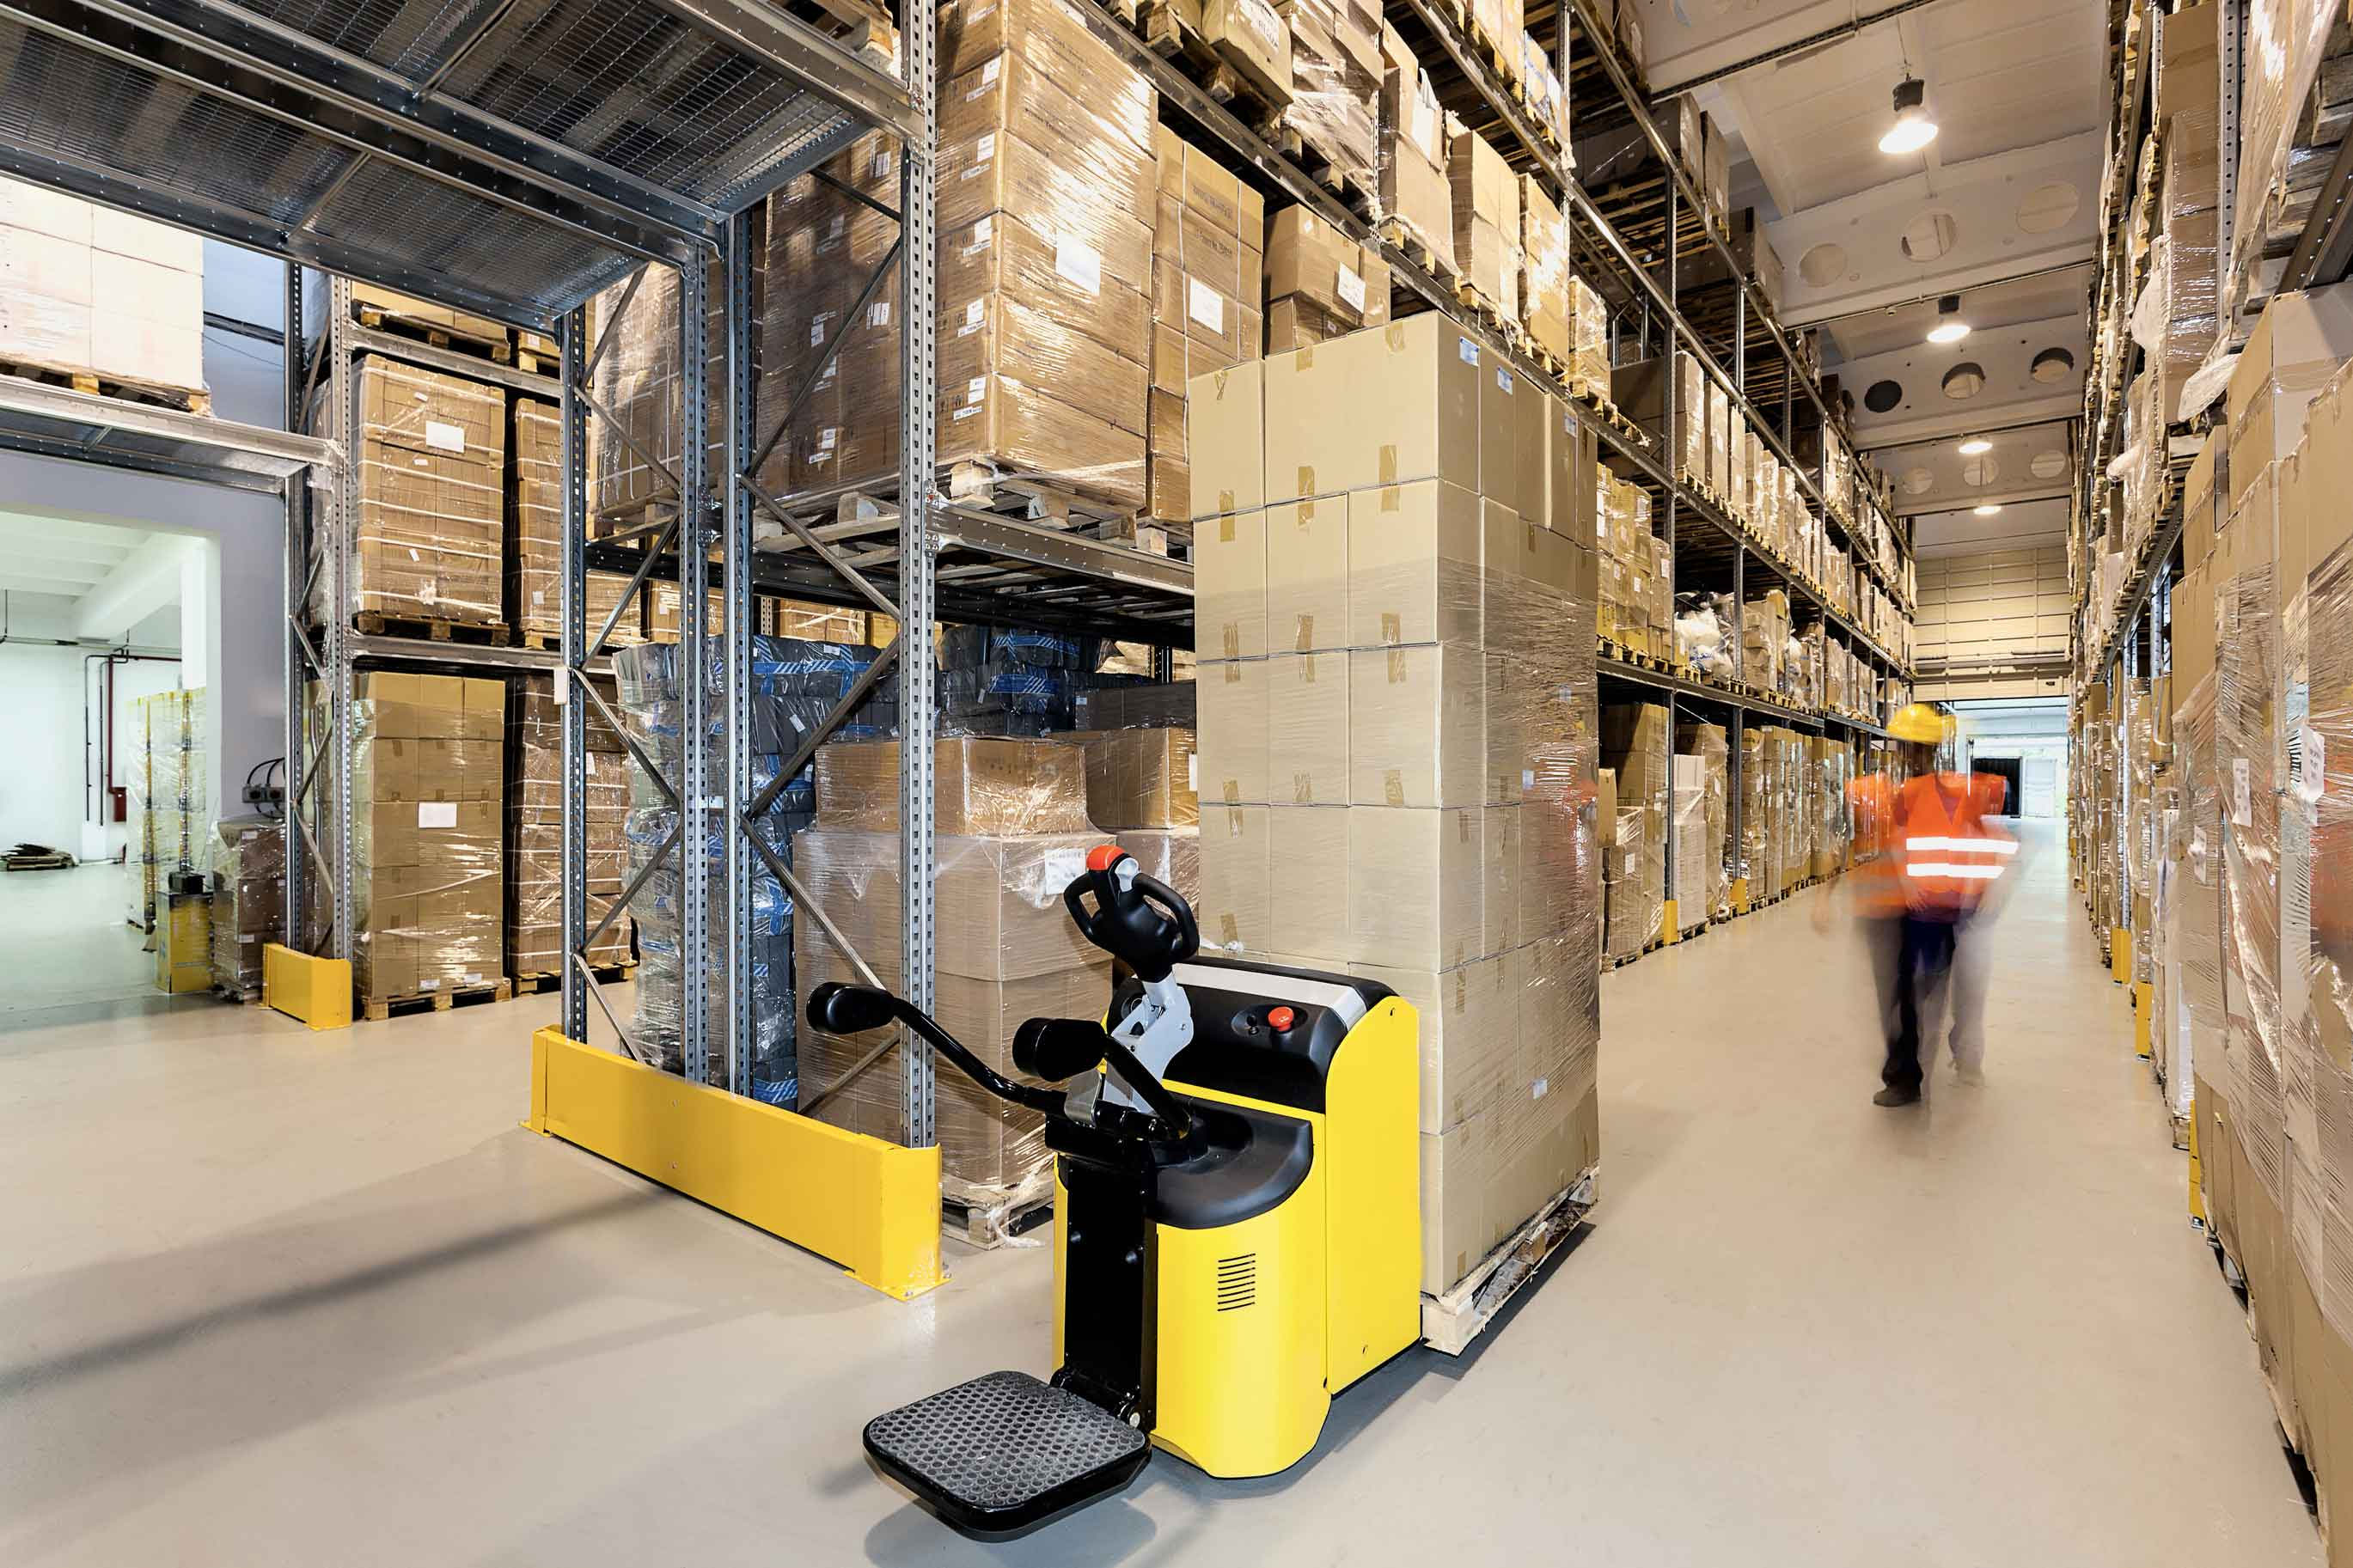 dreamstime l 36632083 - Cameras Reduce Warehousing & Manufacturing Losses